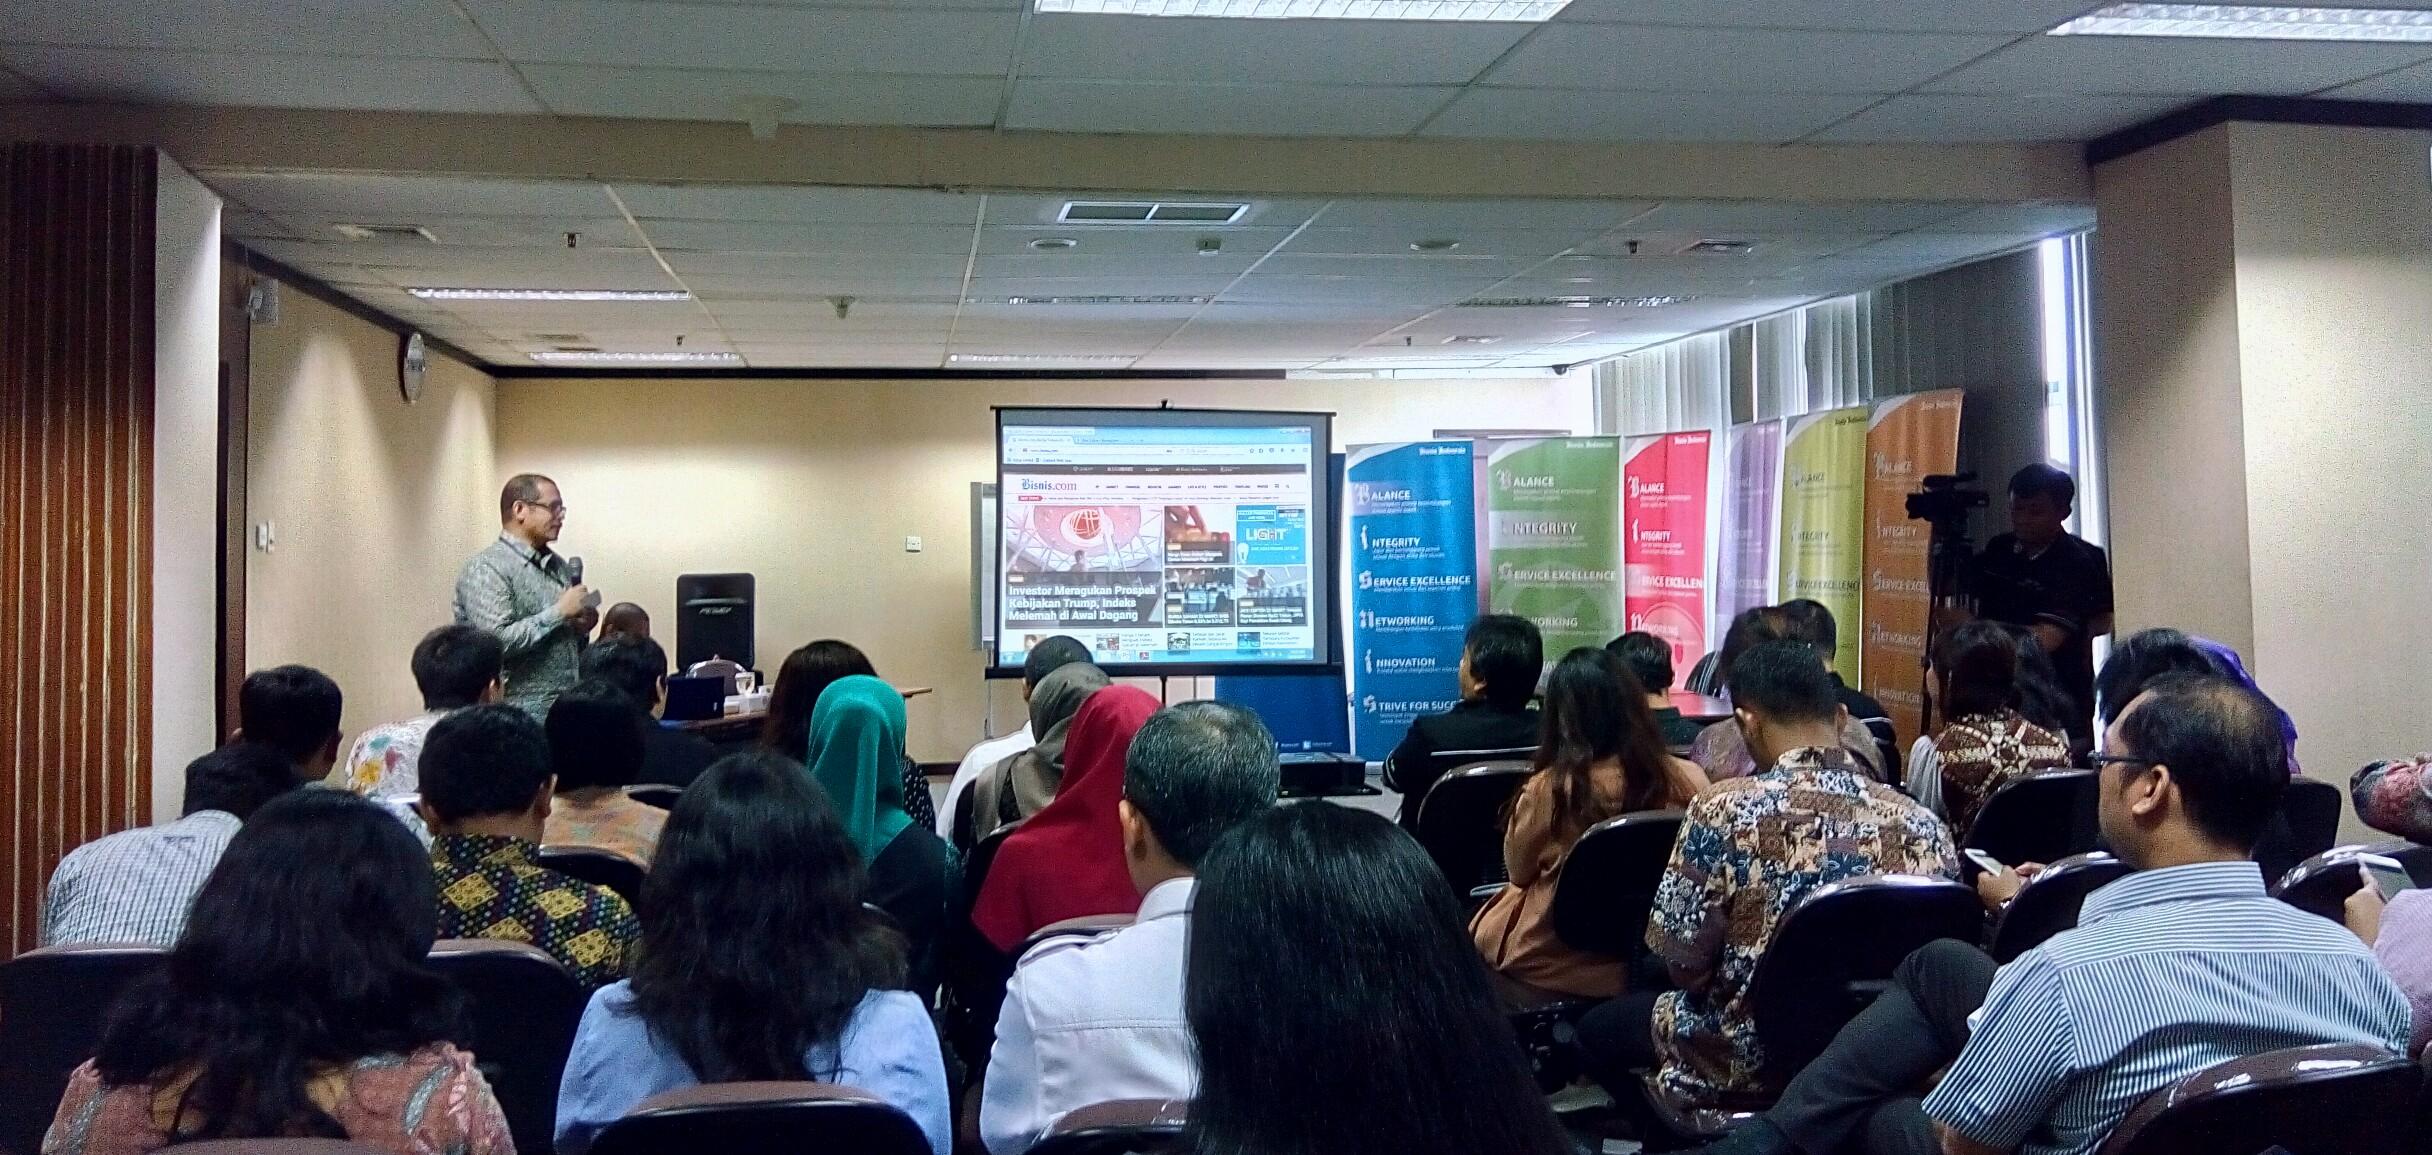 Suasana Workshop Pengelolaan Media dan Promosi Kerja Sama Selatan-Selatan (KSS) Indonesia, di The Hotel Akmani, Jakarta, 21-22 Maret 2017. (Foto: Deny S/Humas)